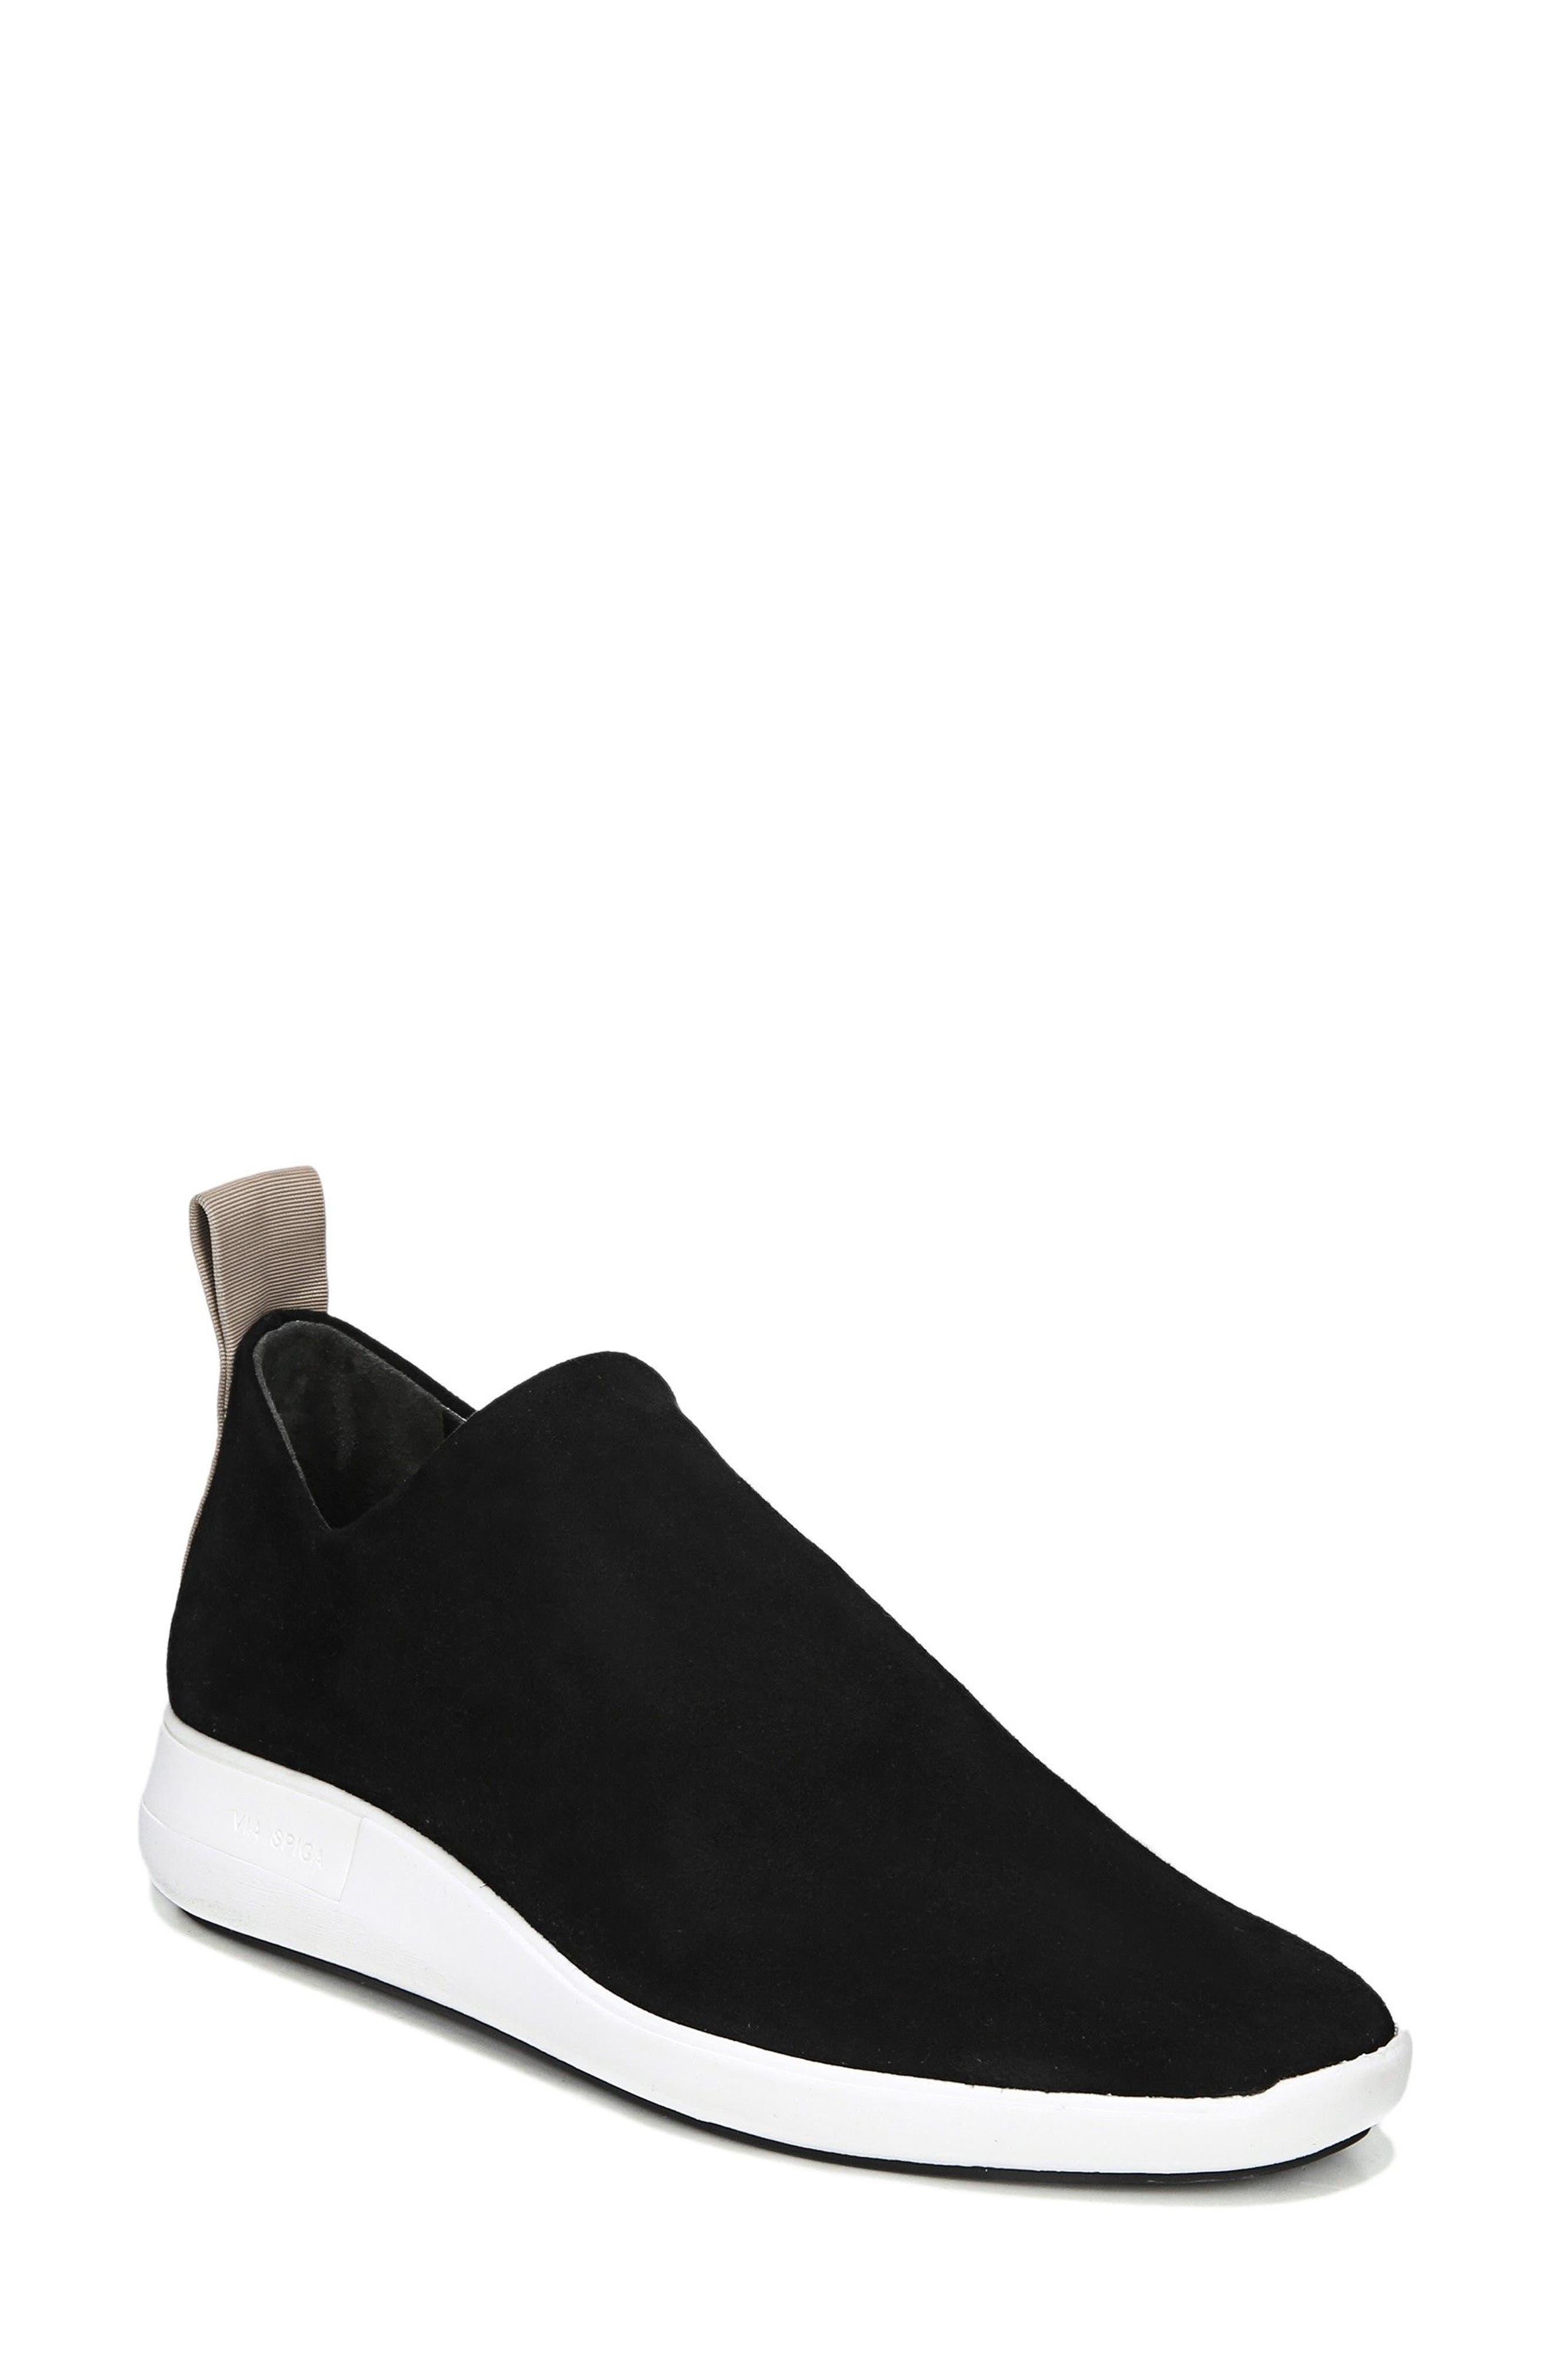 VIA SPIGA Marlow Slip-On Sneaker, Main, color, BLACK SUEDE